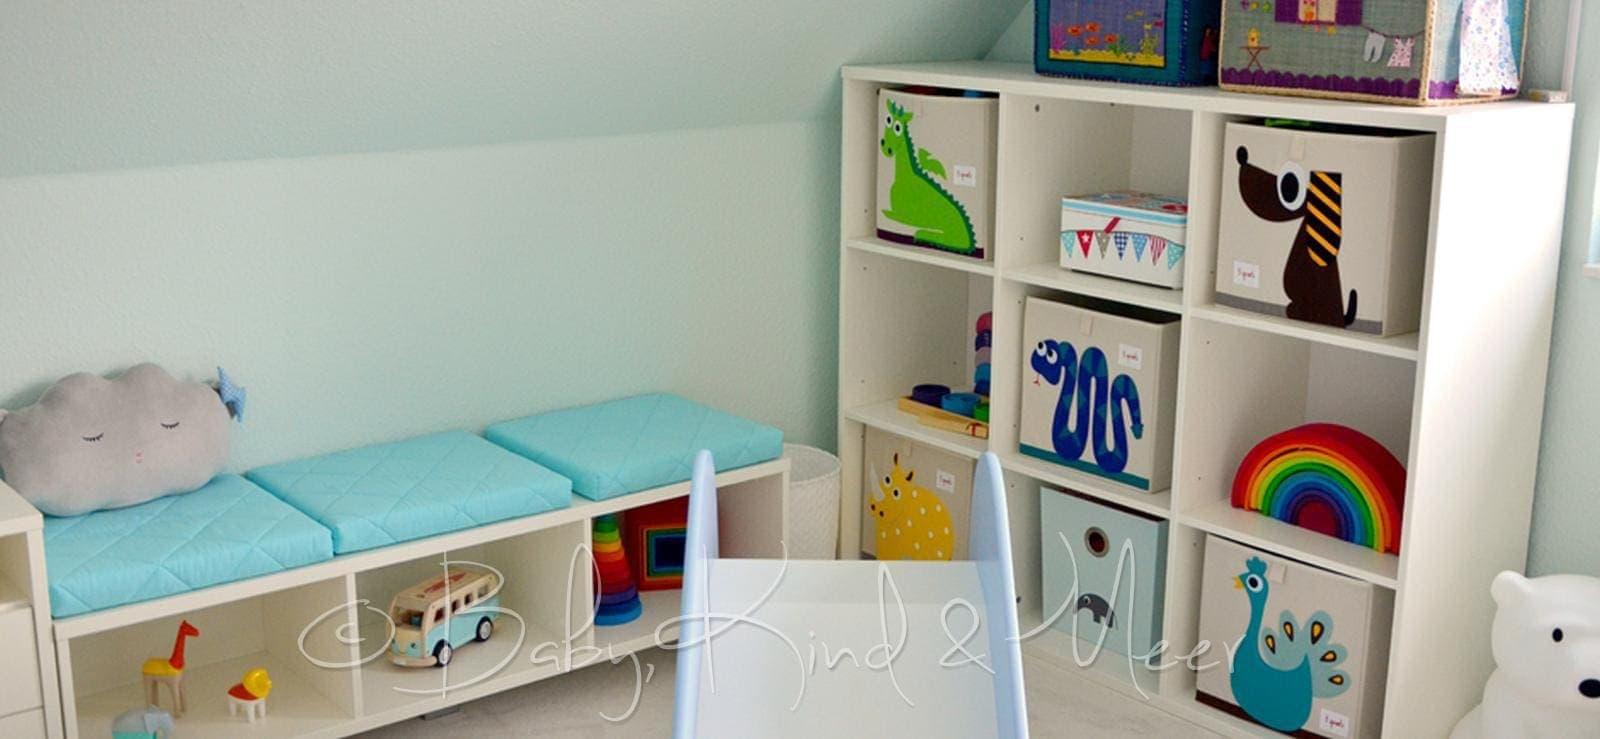 Full Size of Aufbewahrungsboxen Kinderzimmer Stapelbar Design Aufbewahrungsbox Ebay Mint Holz Plastik Ikea Amazon Mit Deckel Regale Sofa Regal Weiß Kinderzimmer Aufbewahrungsboxen Kinderzimmer